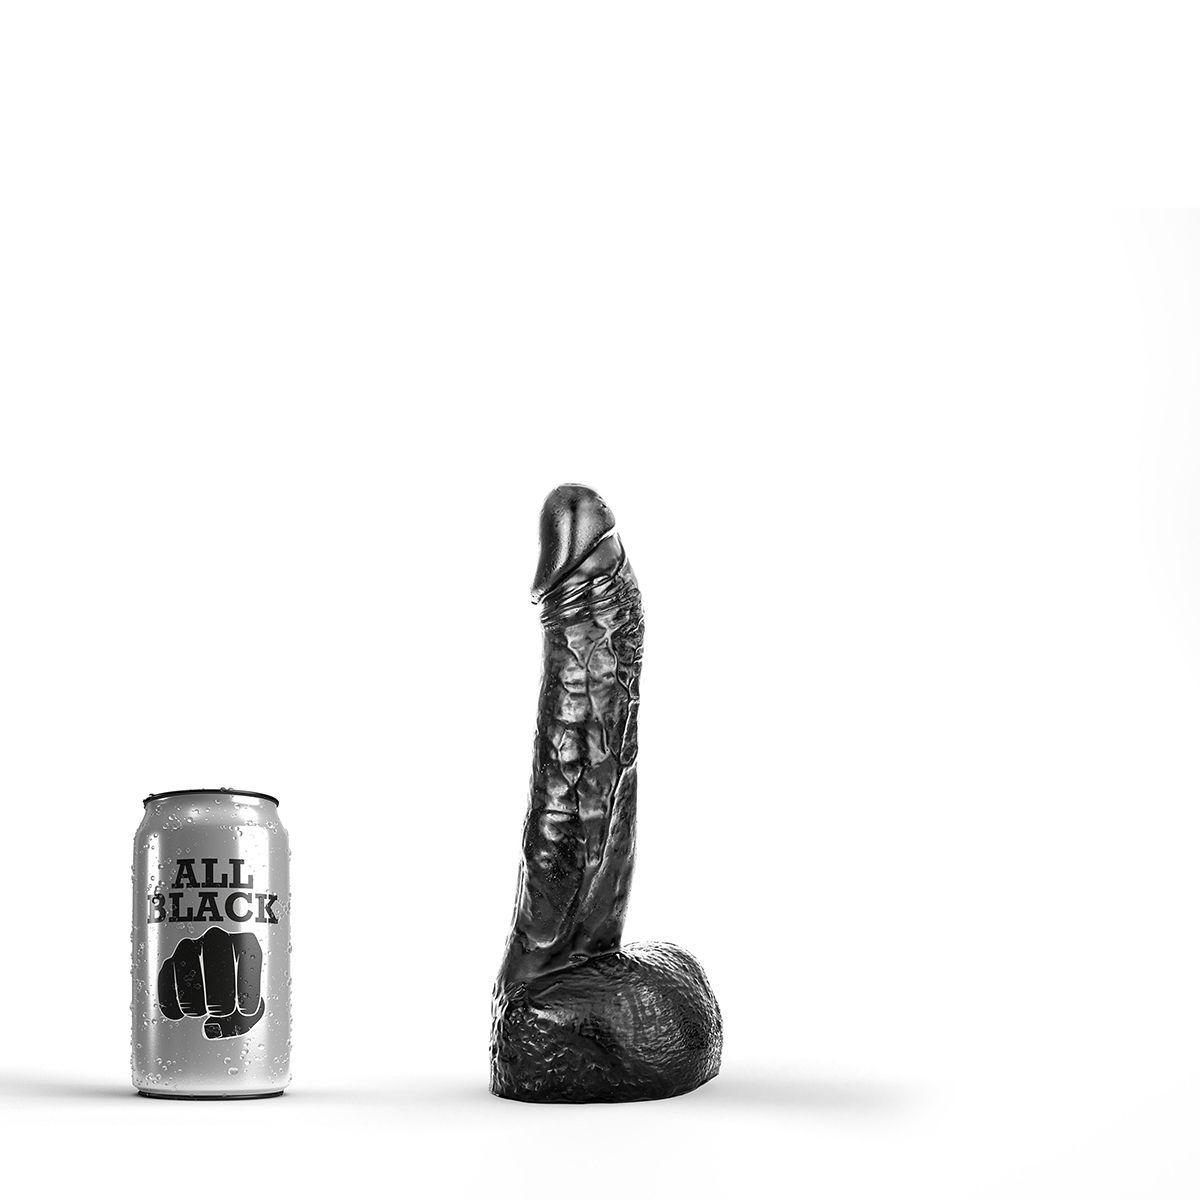 Image of All Black 11 - realistisk anal dildo